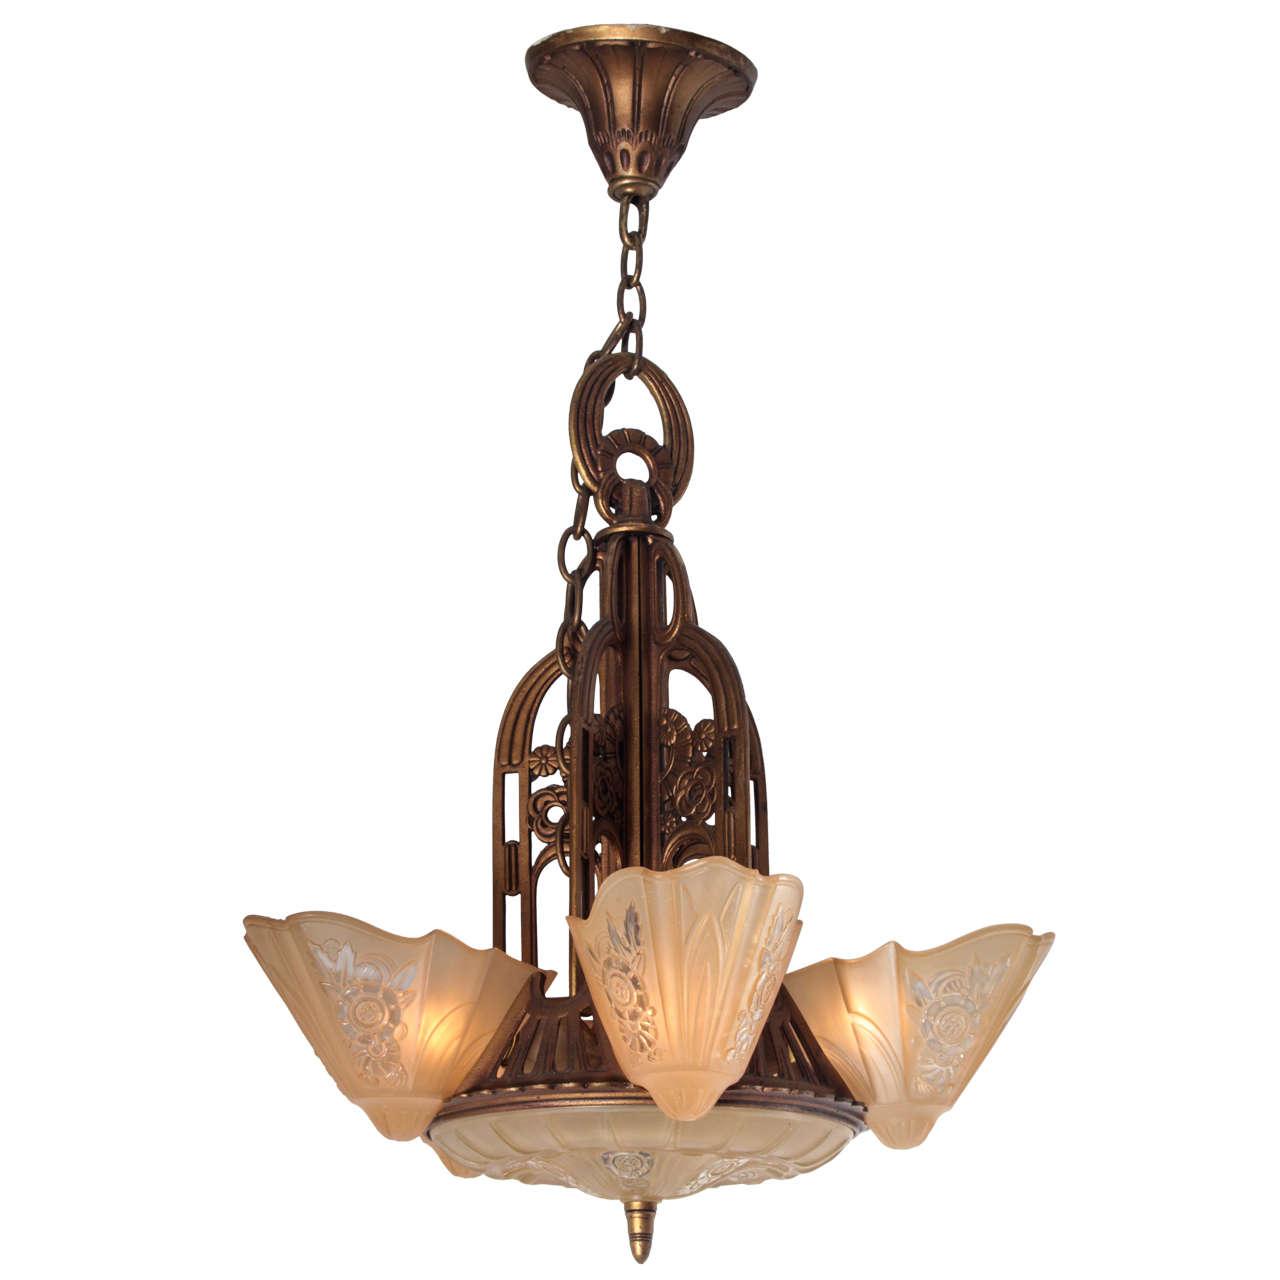 1930s art deco pendant light with amber slip shades at 1stdibs 1930s art deco pendant light with amber slip shades for sale arubaitofo Choice Image